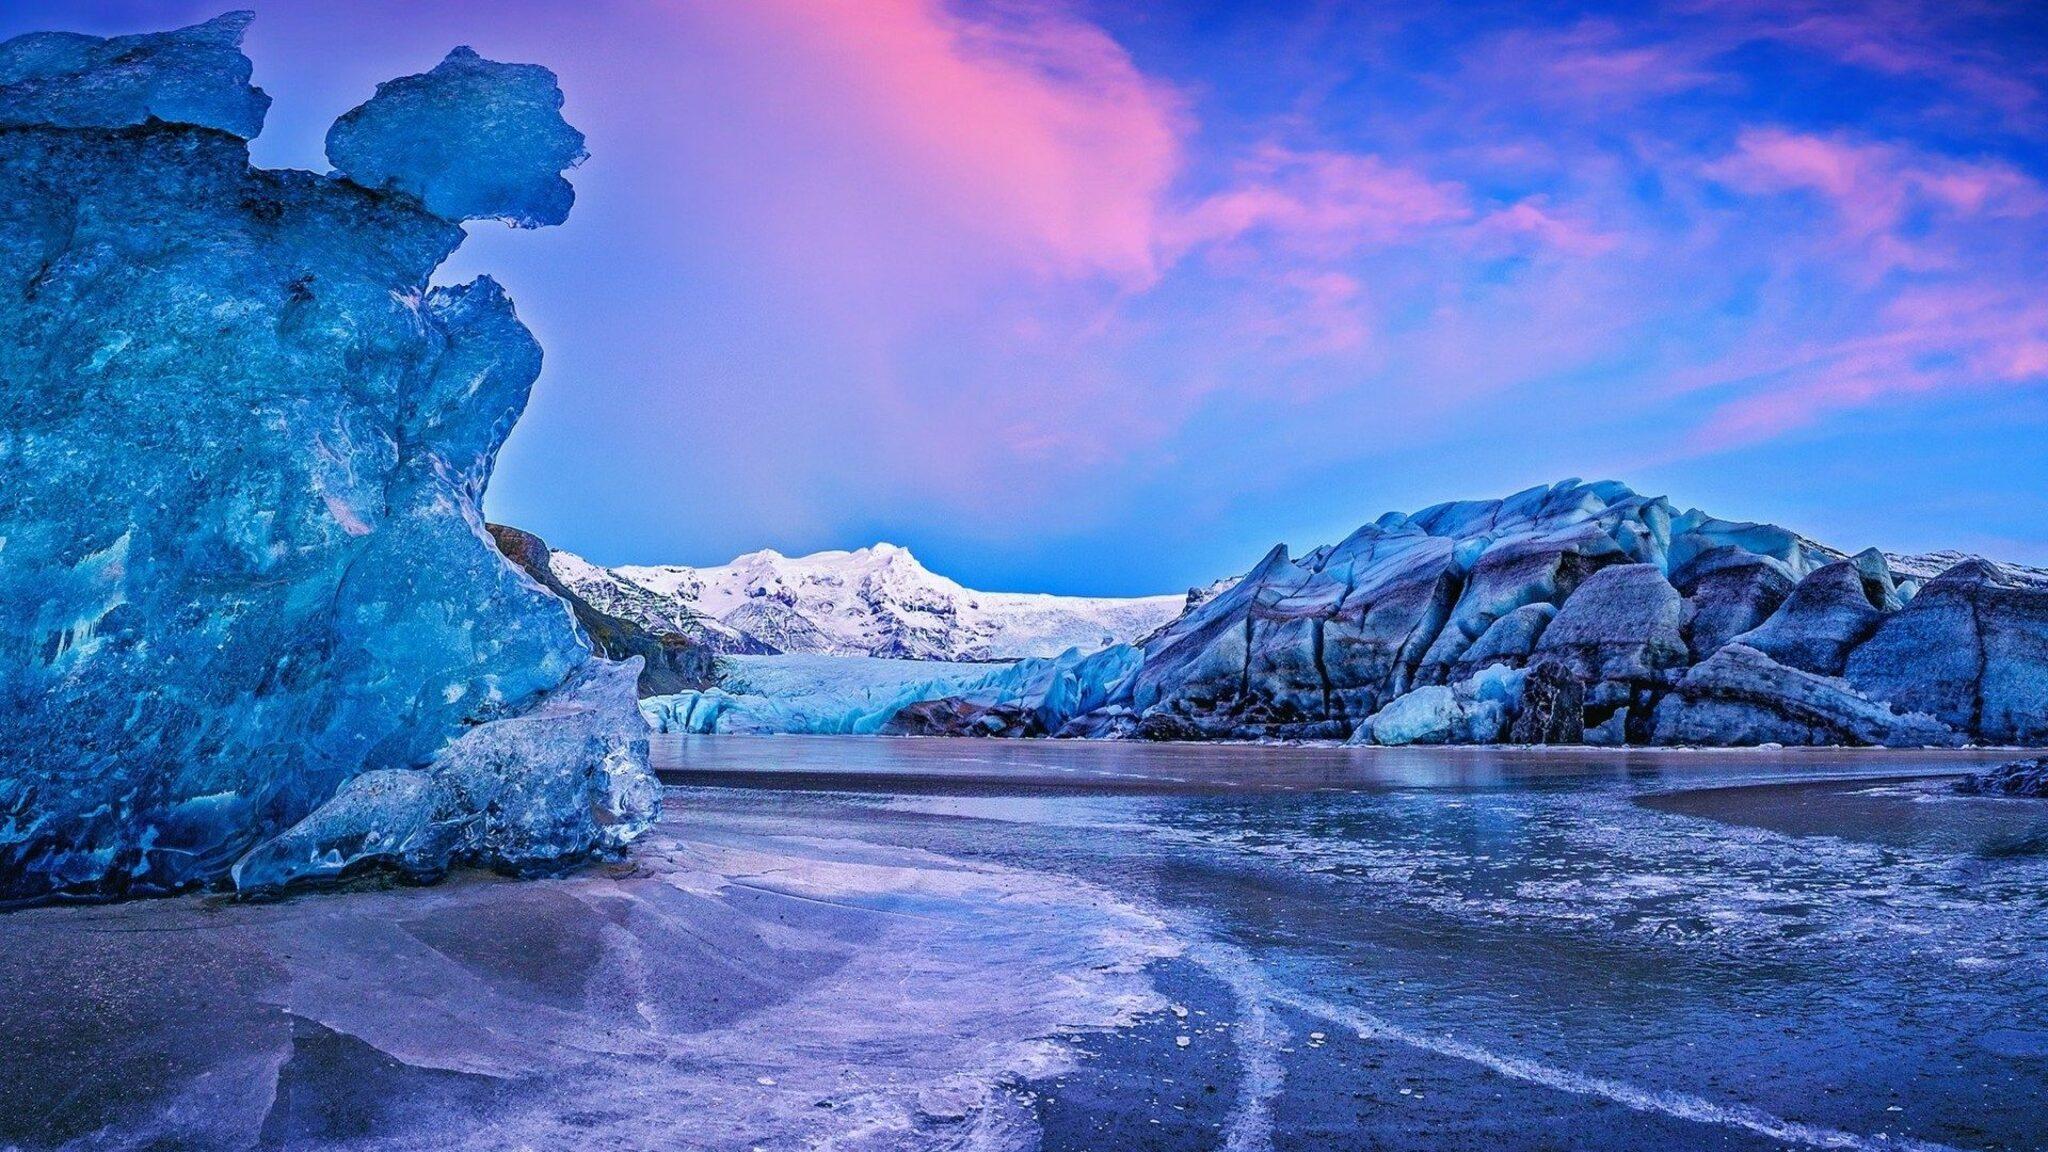 2048x1152 vatna glacier 2048x1152 resolution hd 4k for Sfondi 4k per pc